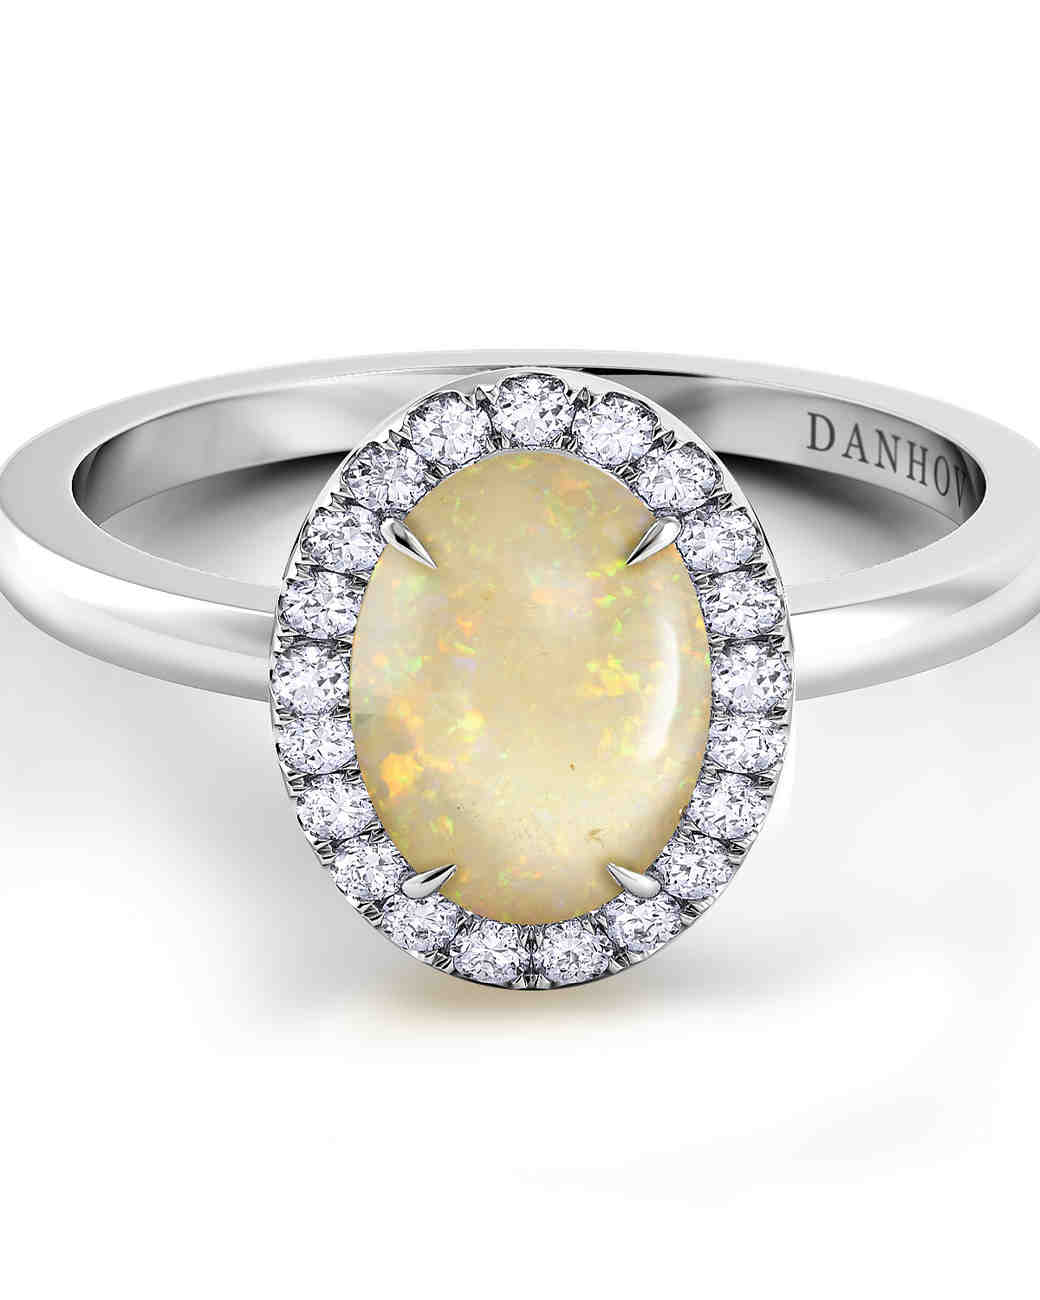 Danhov Opal Engagement Ring